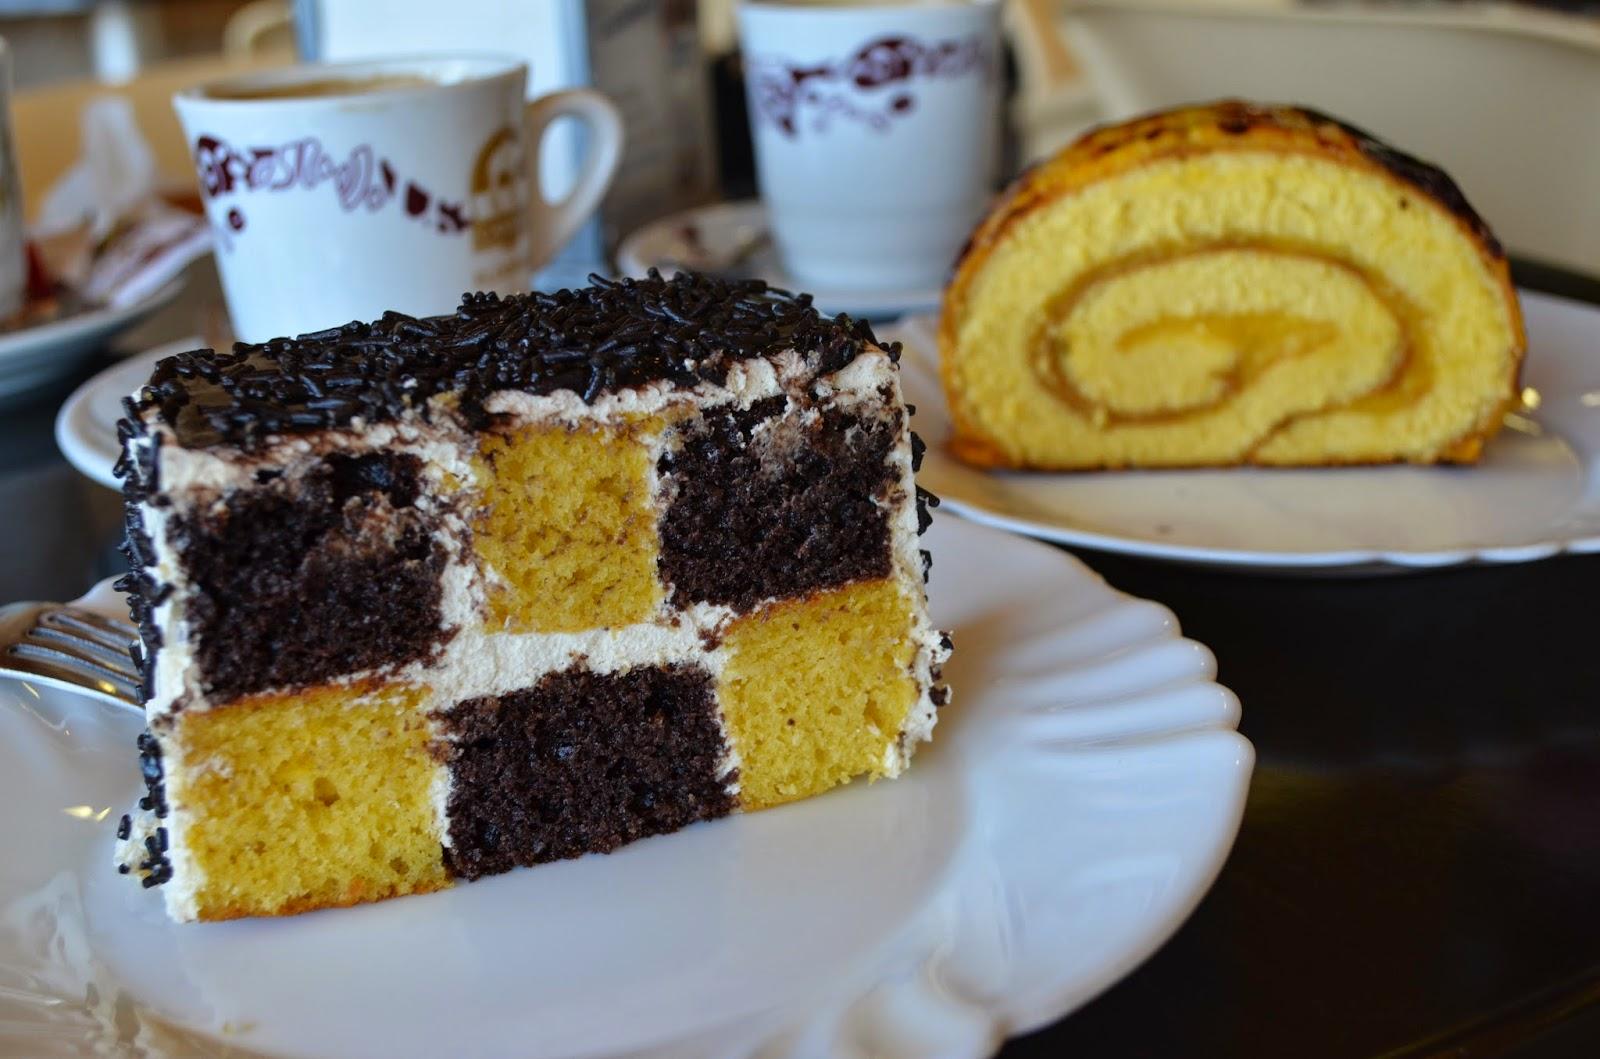 Mi ruta gastronómica por Madeira: Tarta ajedrez